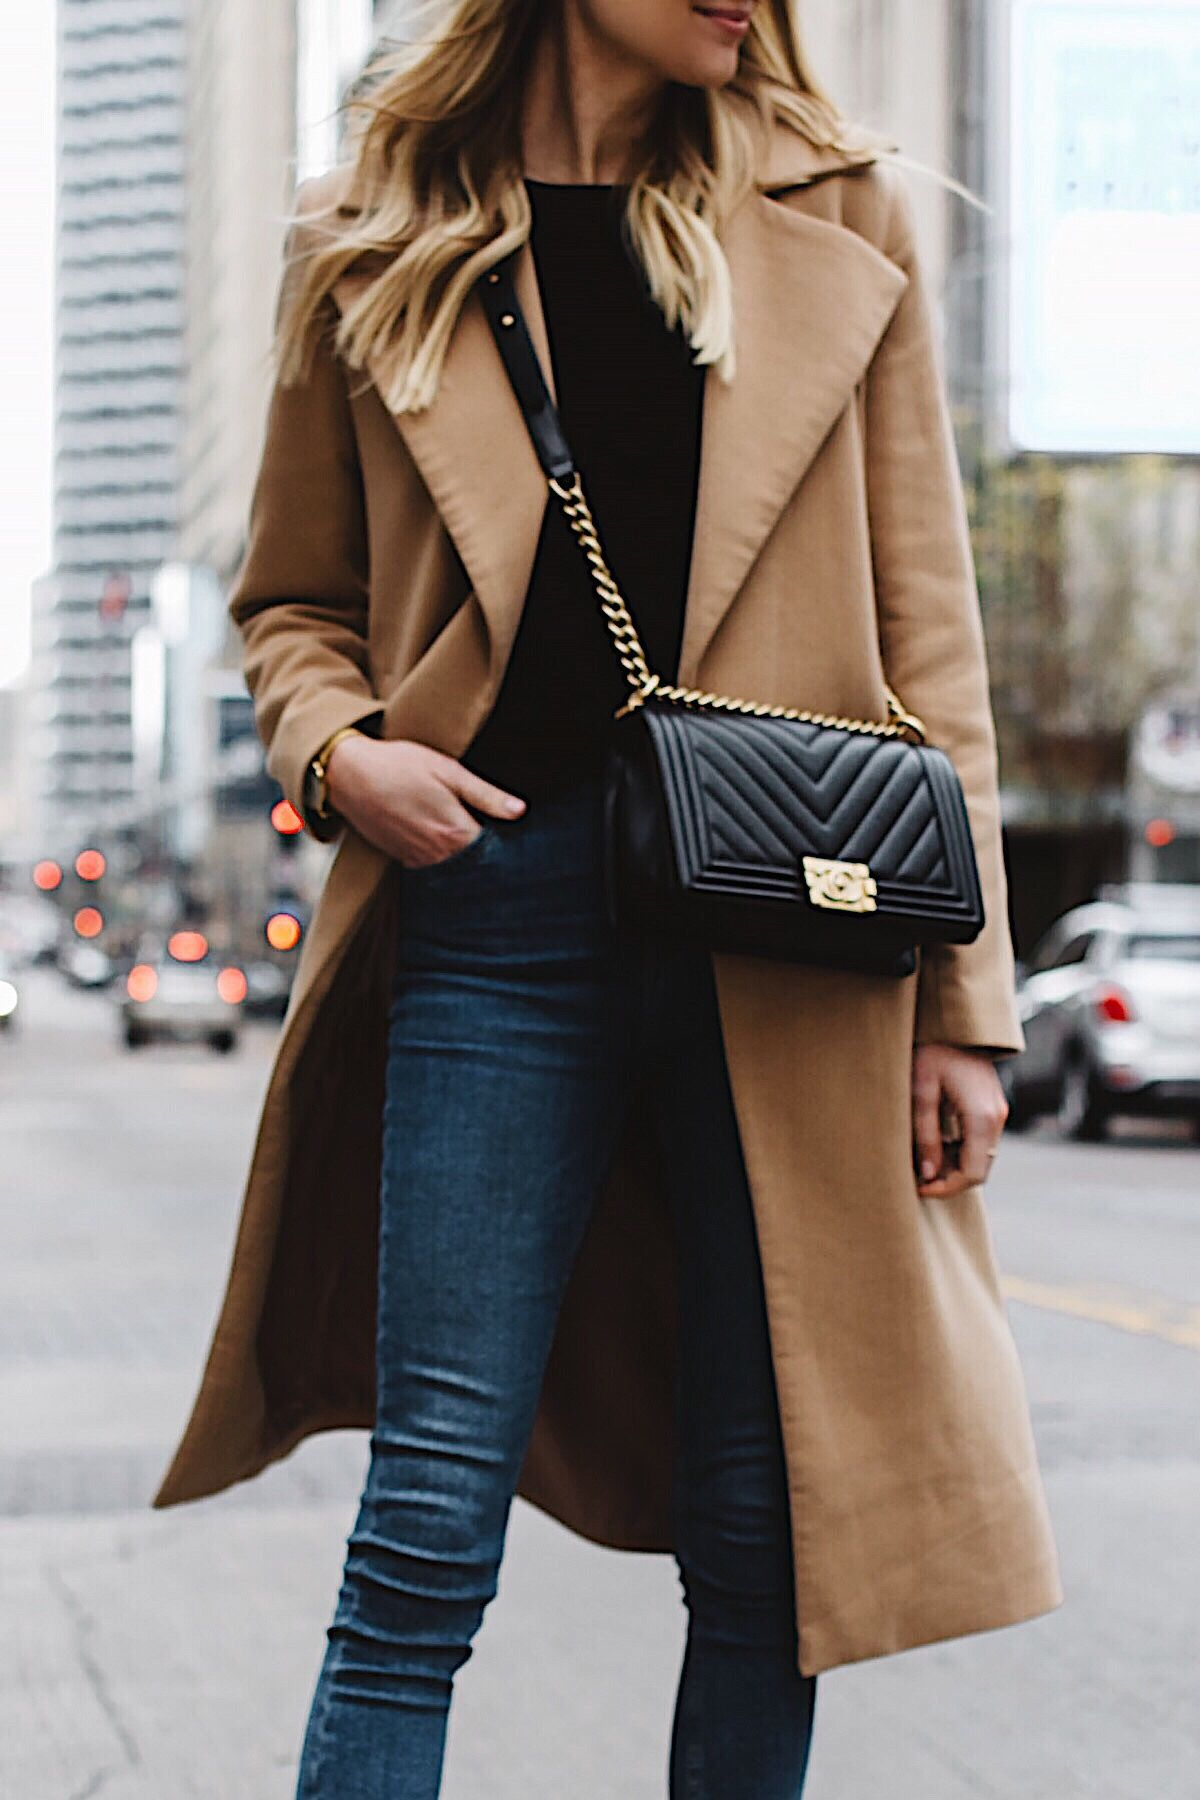 5449a42fc50 woman wearing long camel coat black sweater topshop denim skinny jeans  chanel black boy bag fashion jackson dallas blogger fashion blogger street  style